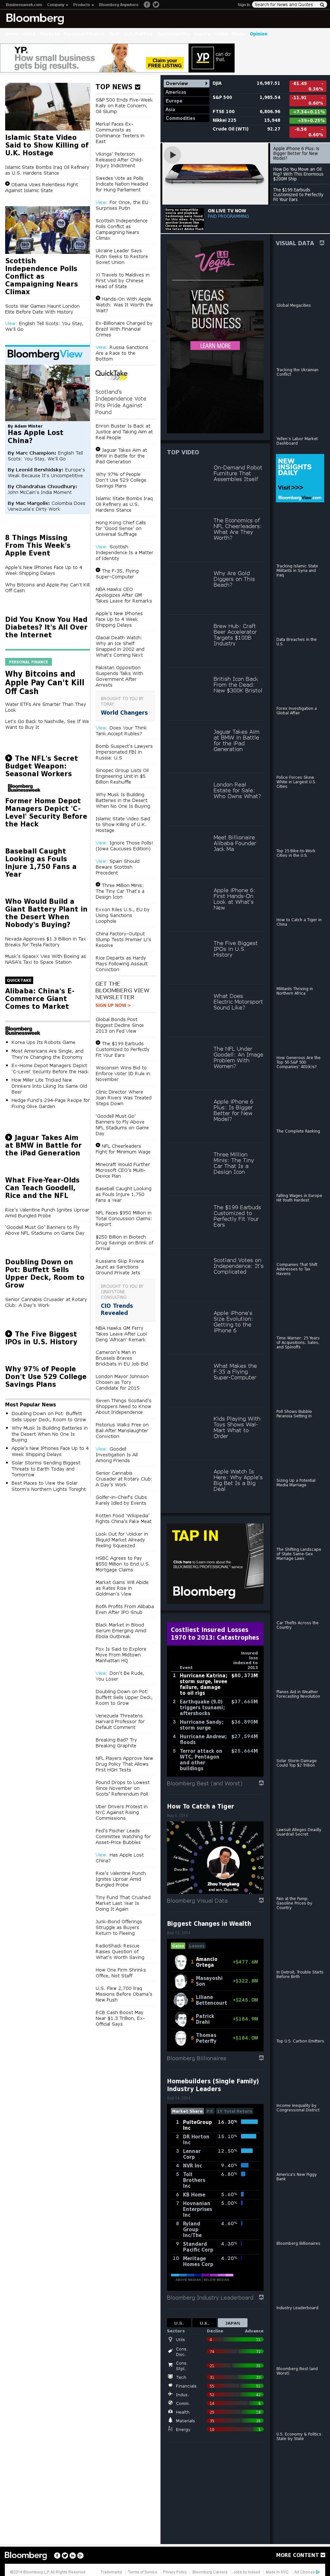 Bloomberg at Sunday Sept. 14, 2014, 5 a.m. UTC